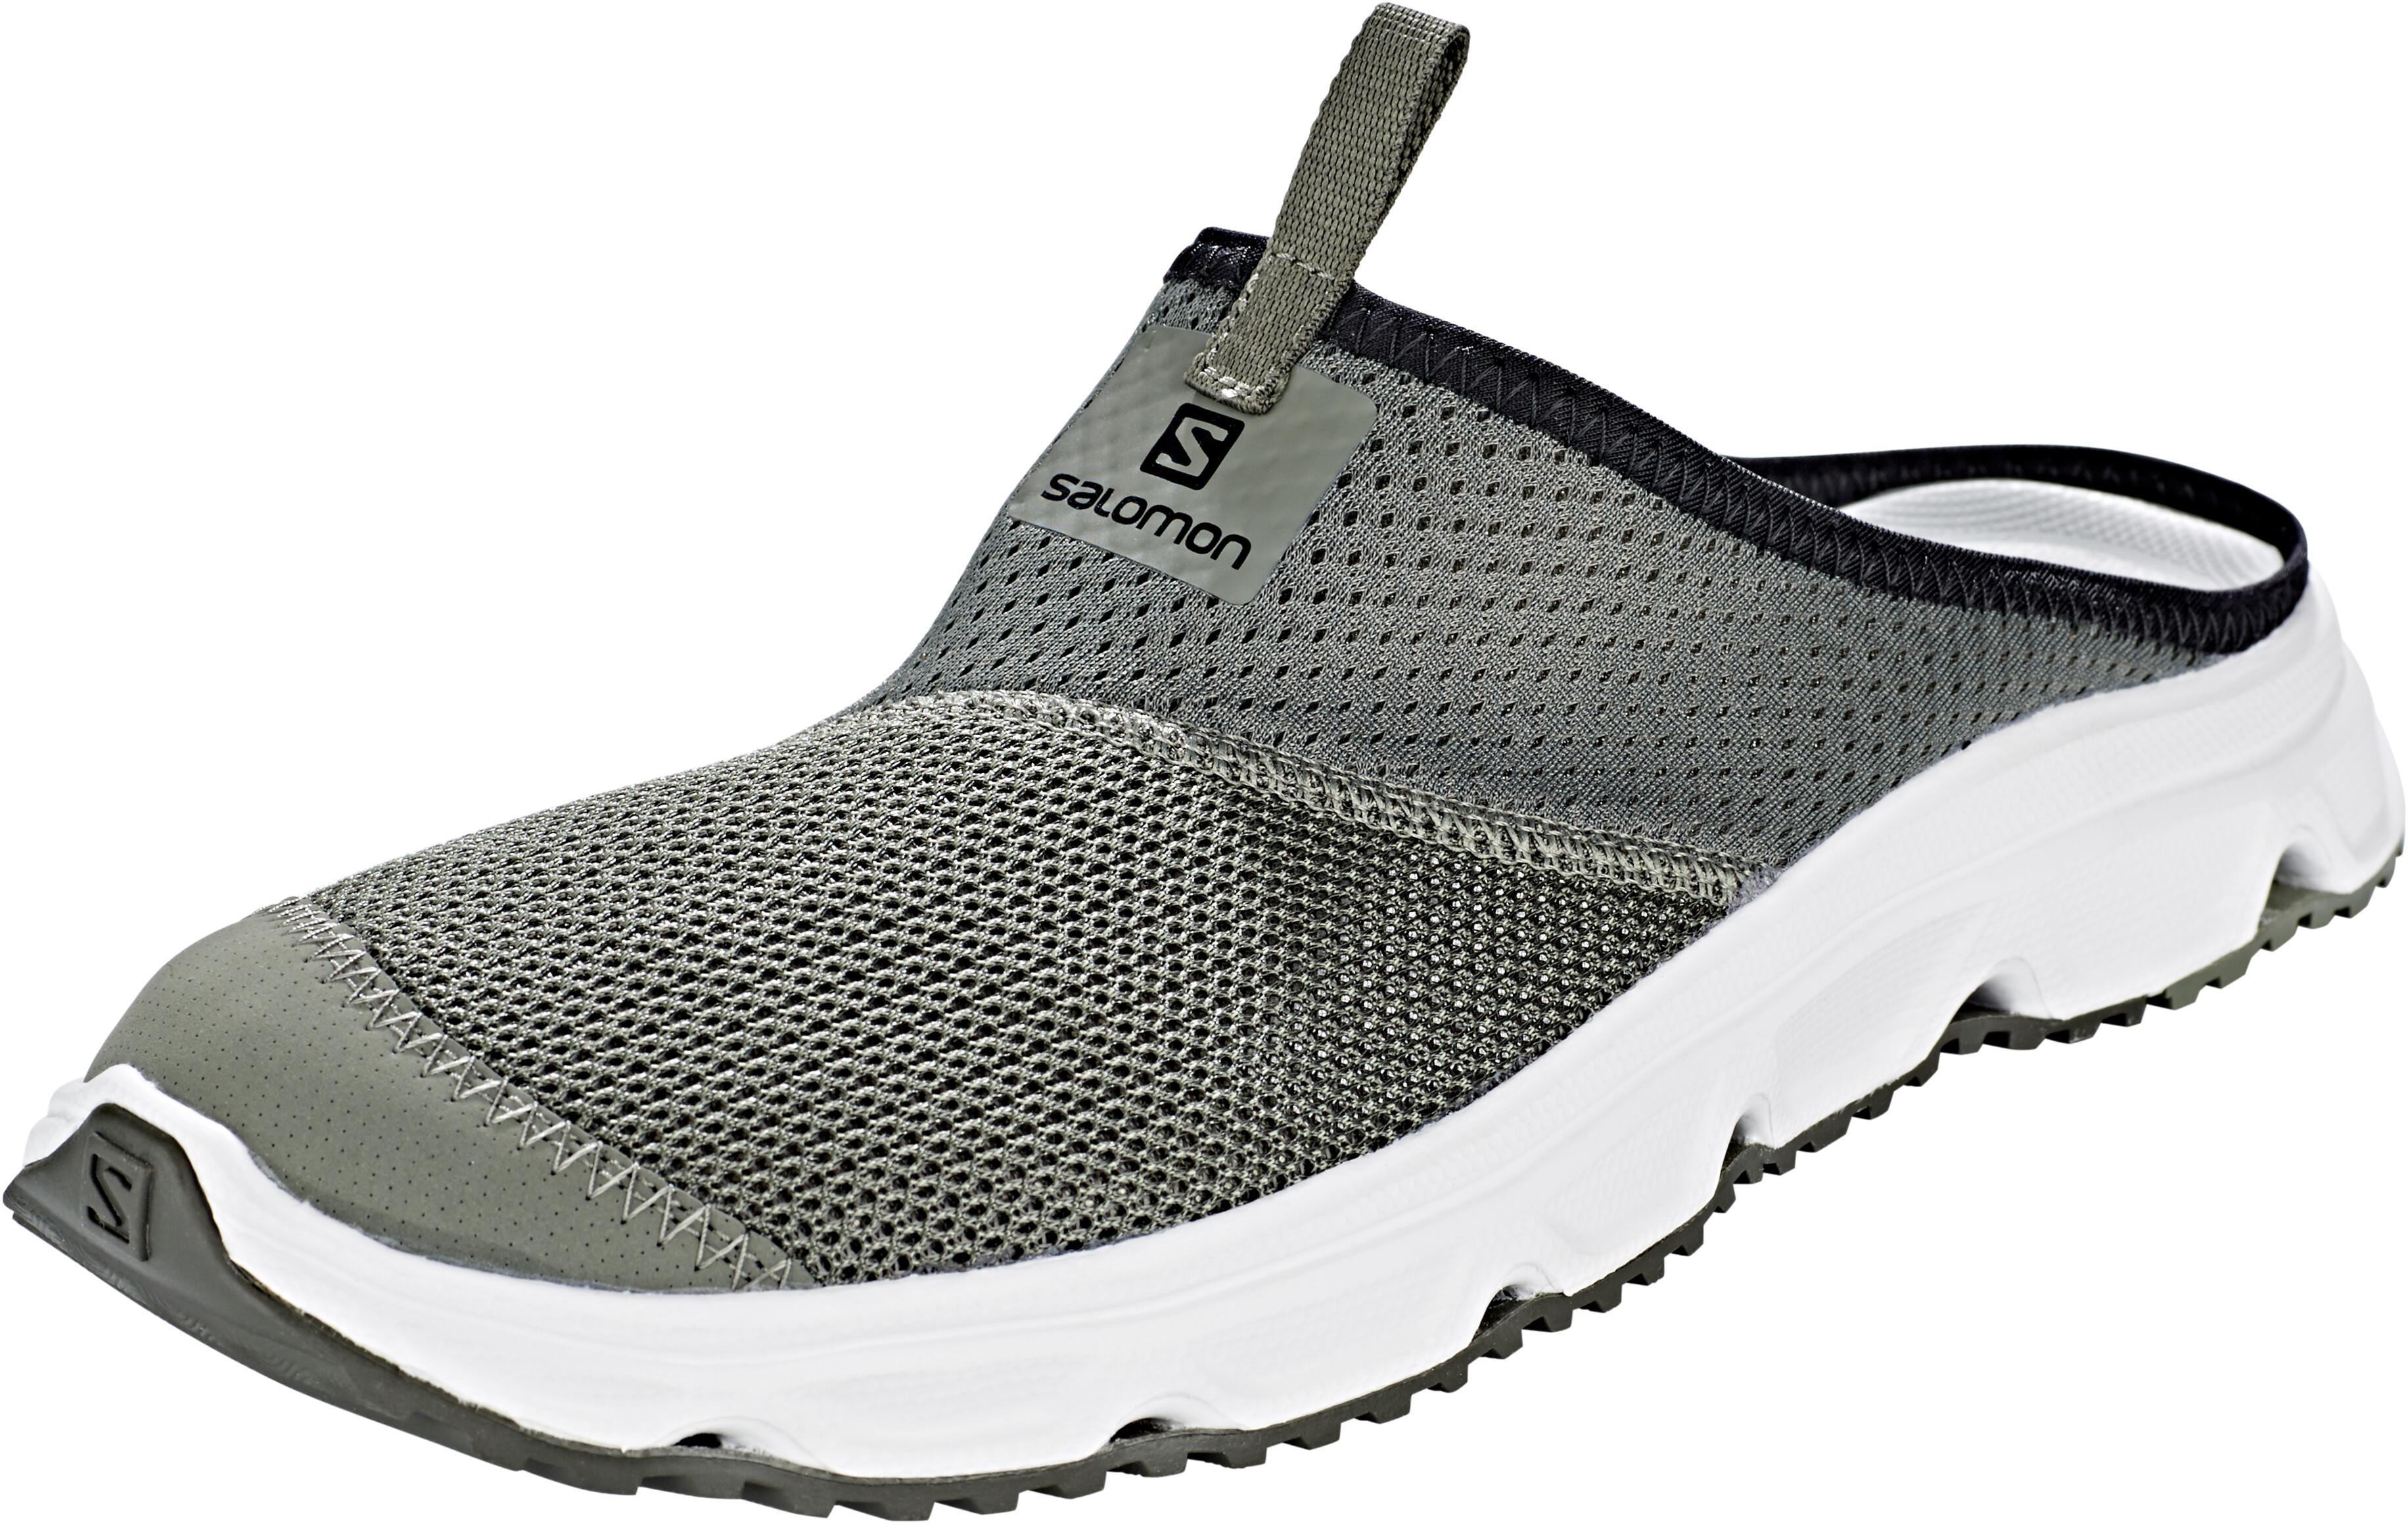 neue Kollektion wähle echt online Shop Salomon RX Slide 4.0 Shoes Men castor gray/white/beluga